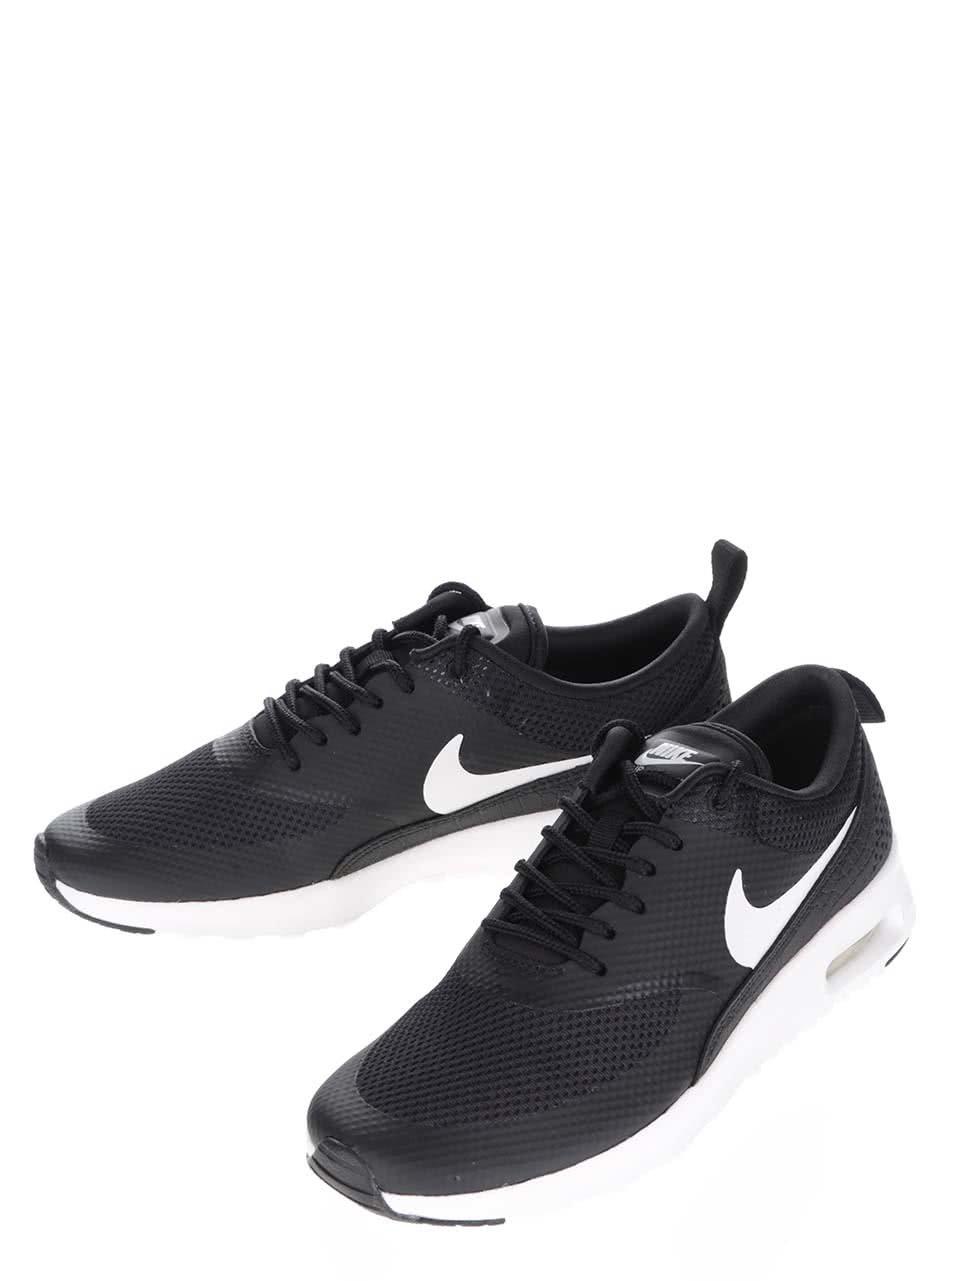 outlet store ad34f d9b31 Pantofi sport negri pentru femei Nike Air Max Thea ...